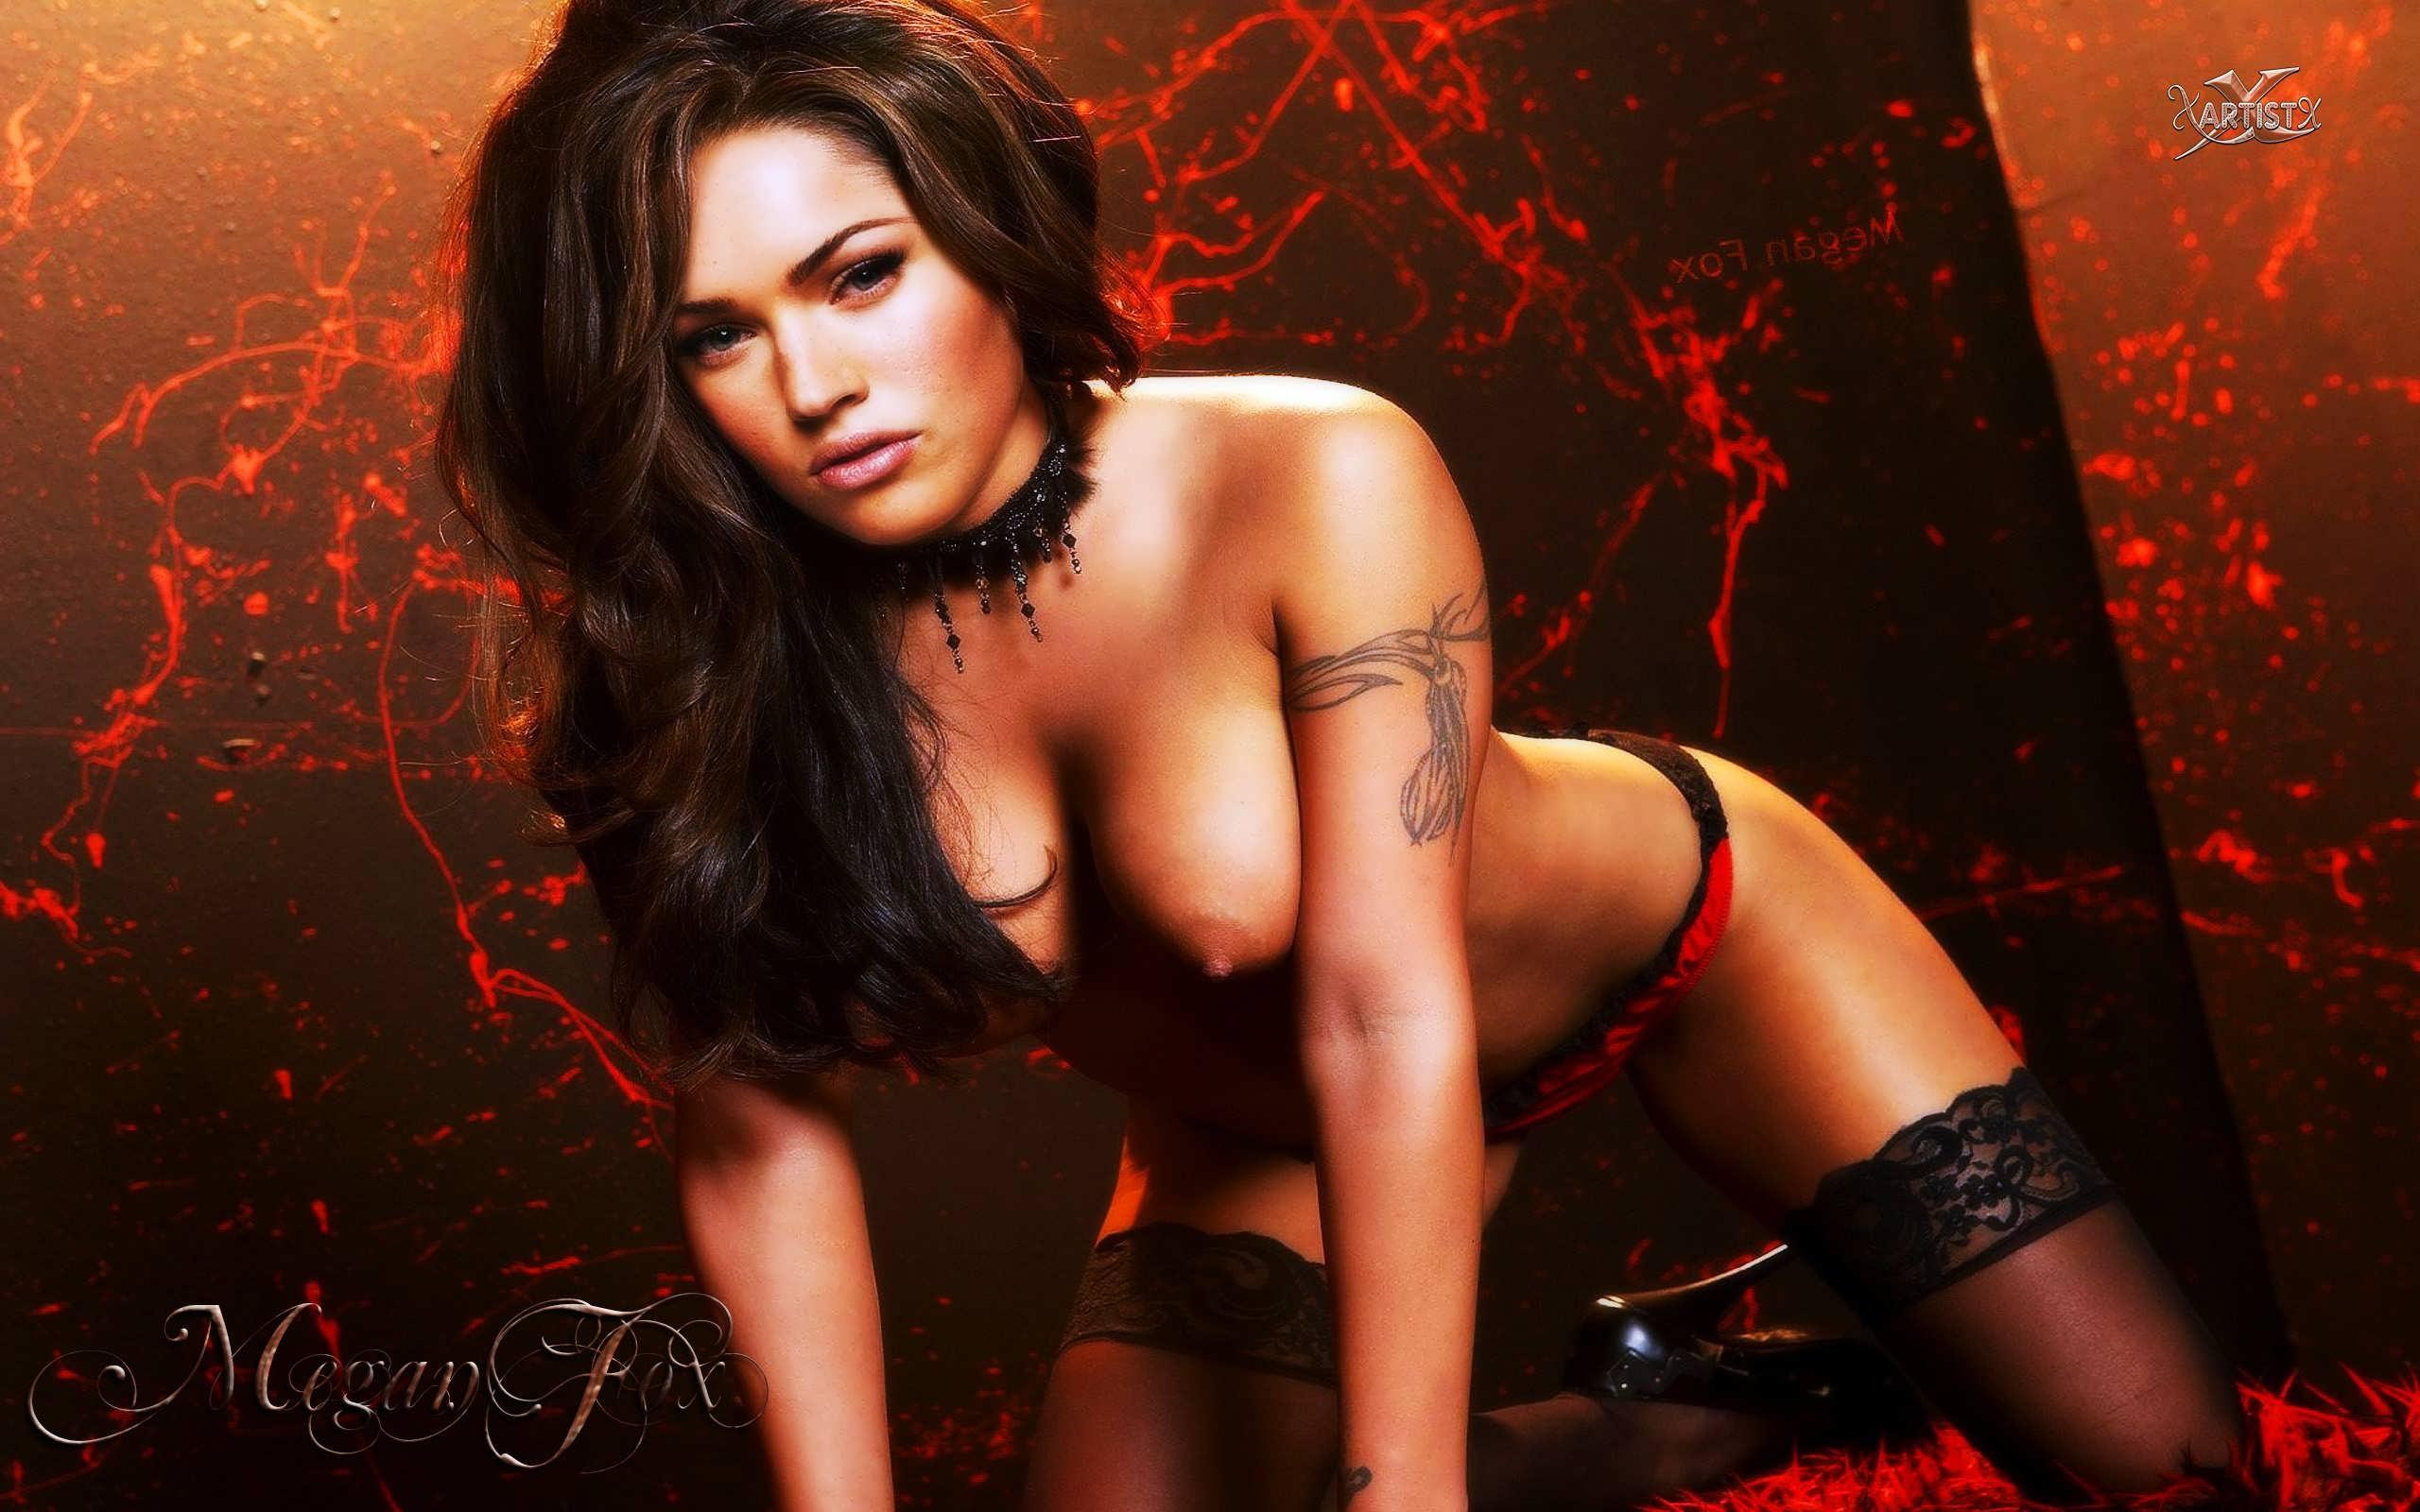 Wallpaper Megan Fox, Actress, Fake, Hot, Boobs, Tits -8015